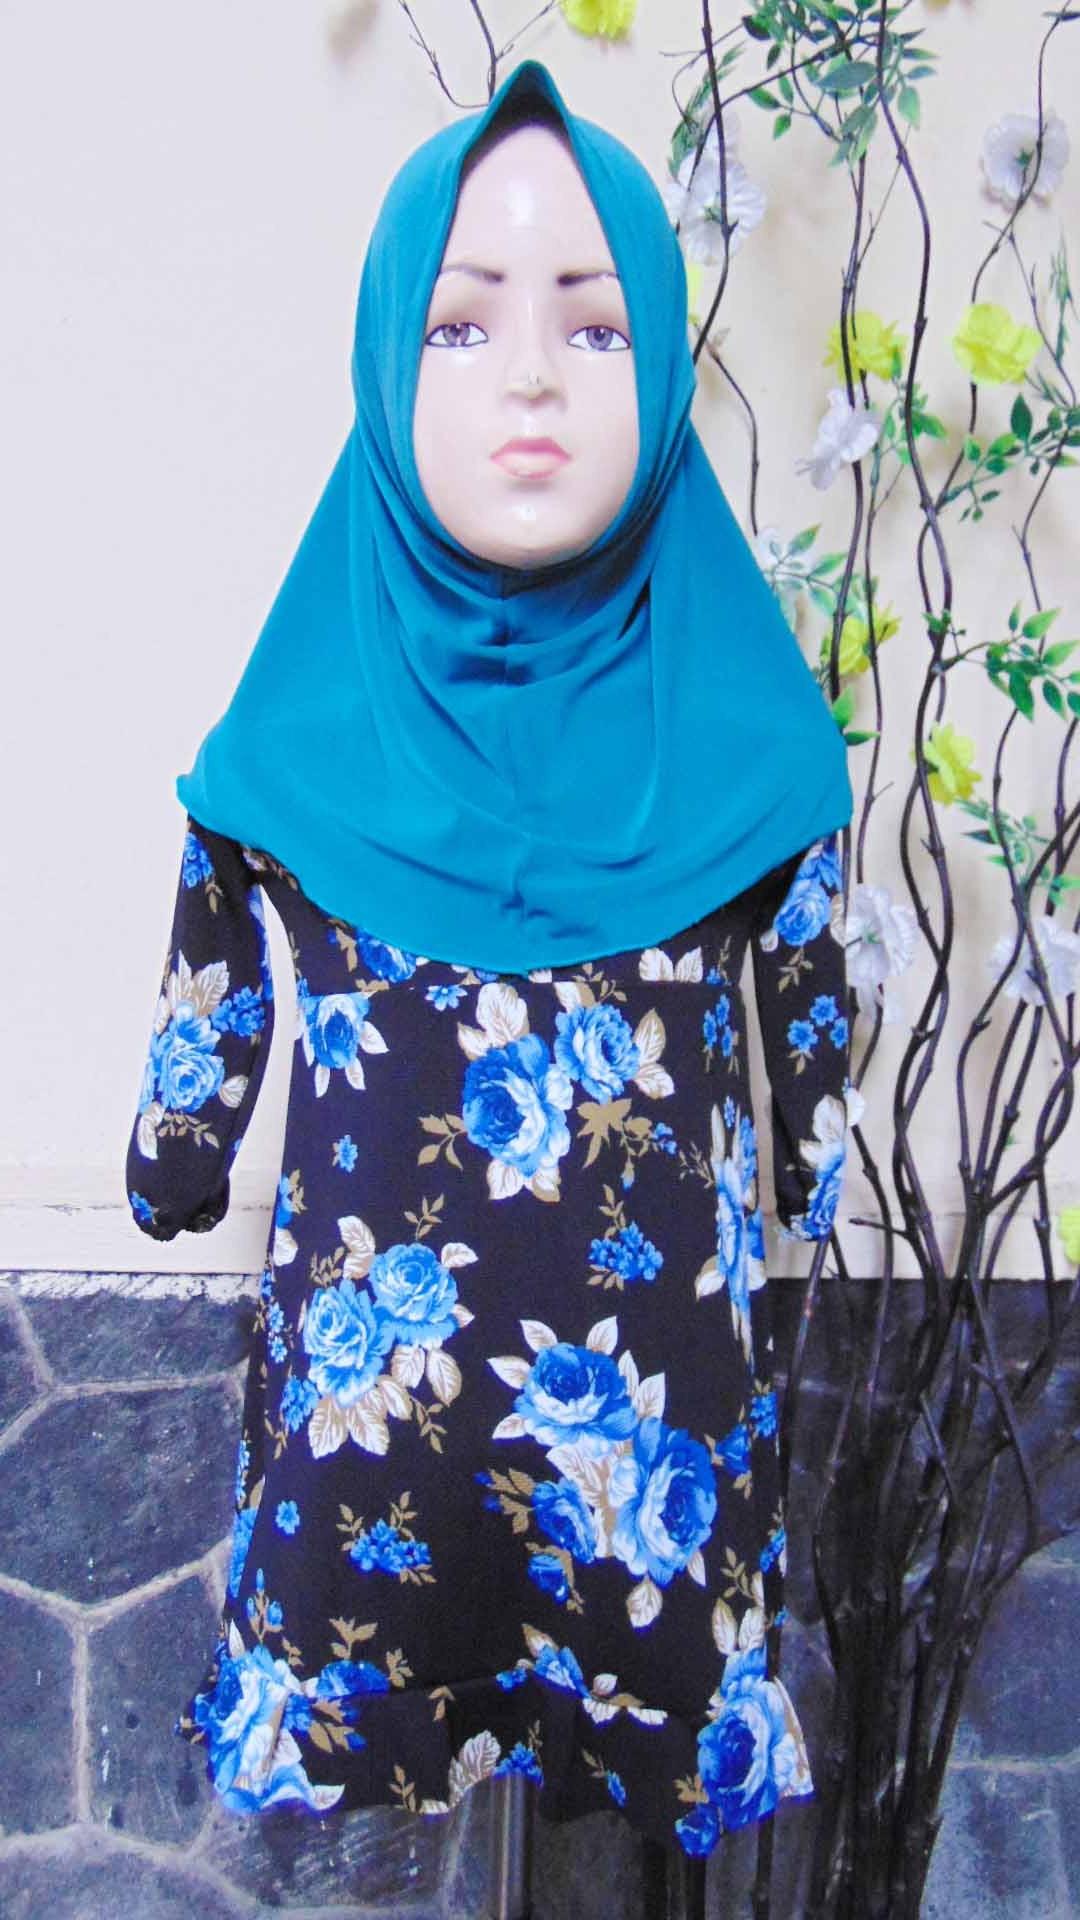 PALING MURAH Baju Muslim Gamis Aisyah Anak Bayi Perempuan 1-2th Plus Hijab floral beautiful blue 45 Lebar Dada 29cm, Panjang 52cm